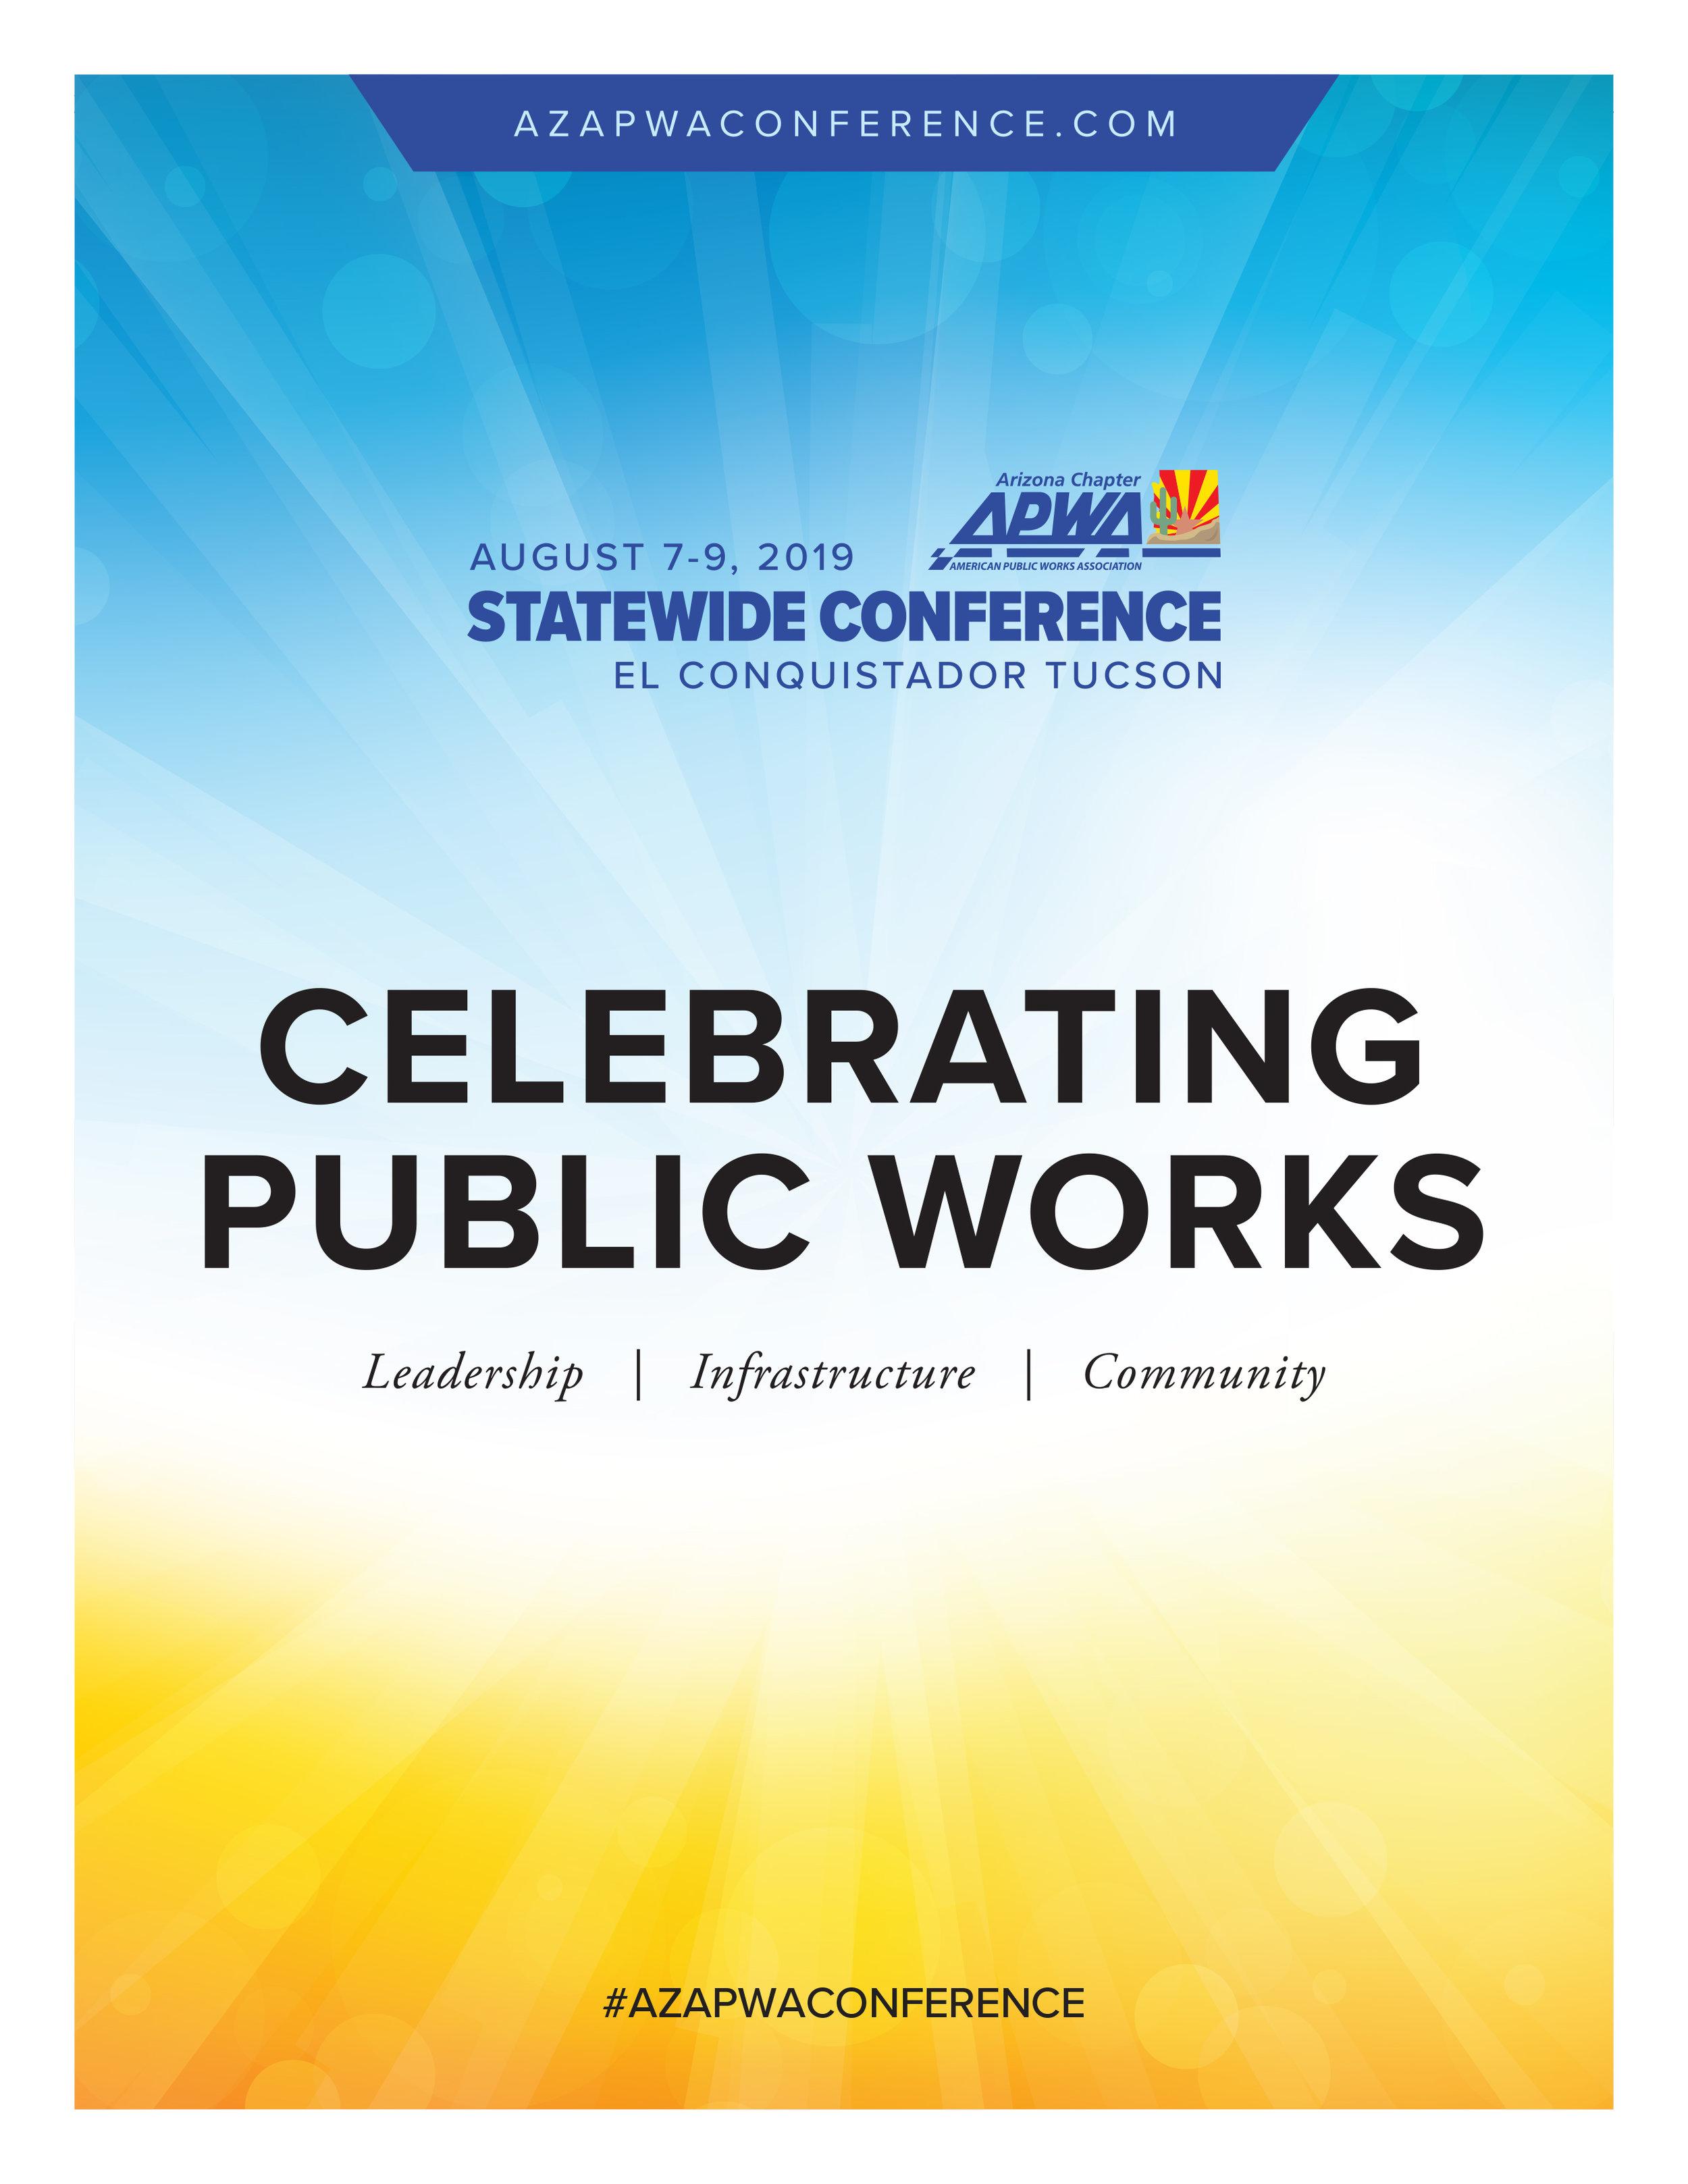 APWA 2019 CONFERENCE PROGRAM COVER FOR WEBSITE.jpg